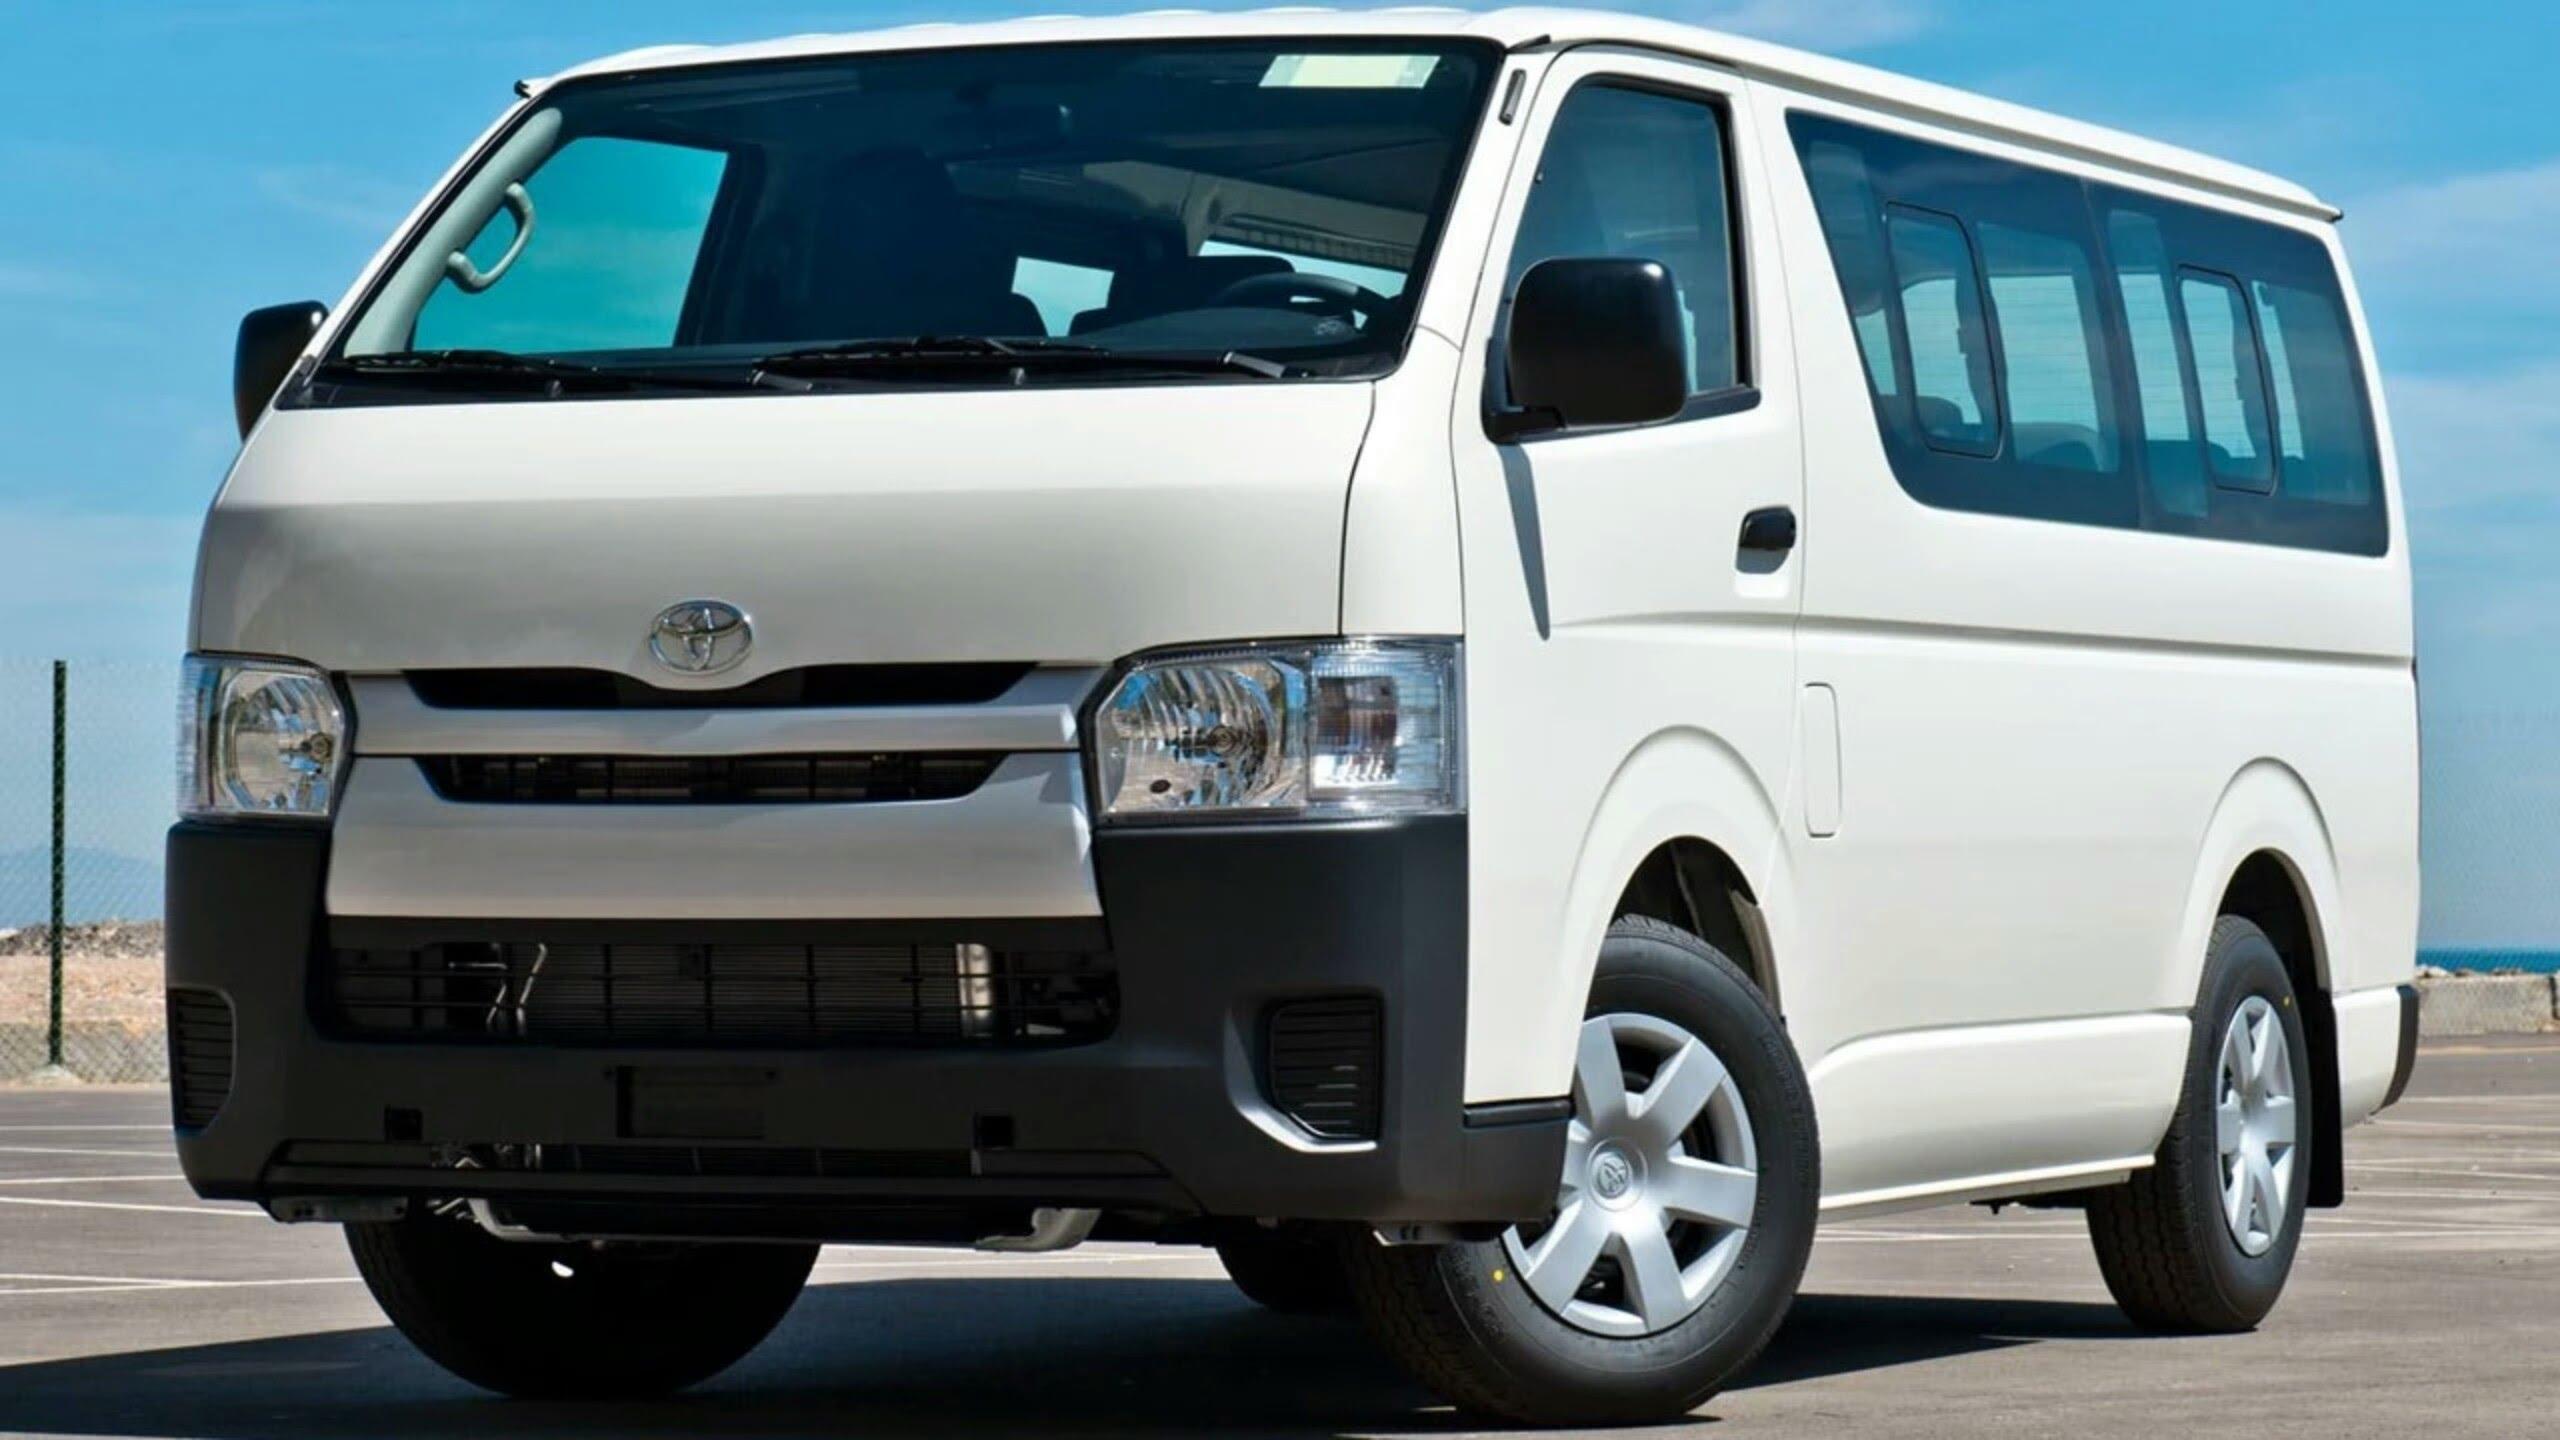 Mau Liburan? Tips Memilih Penyewaan Mobil Hiace yang Baik - Toyota Hiace, Pilihan Terbaik untuk Perjalanan Rombongan dan Keluarga